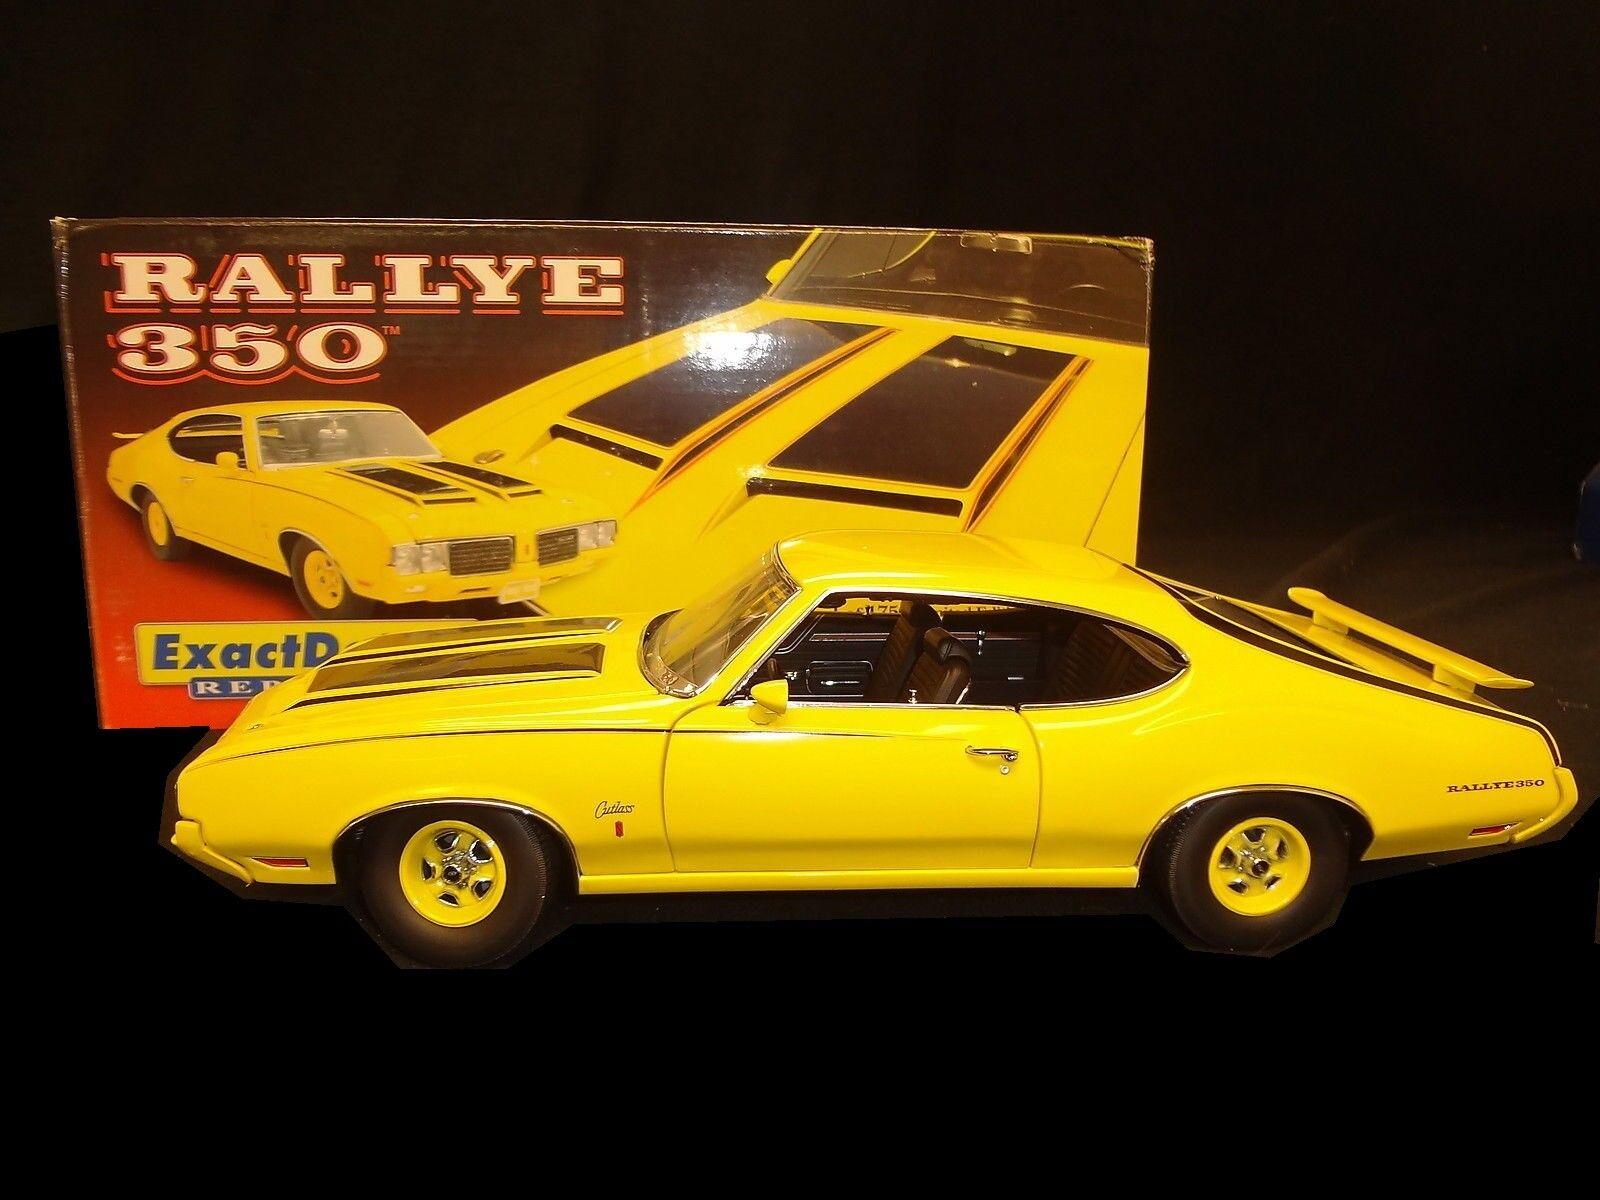 1 18 Oldsmobile RALLYE 350 Gelb 1970 LANE   Exact Detail yuk00    Merkwürdige Form